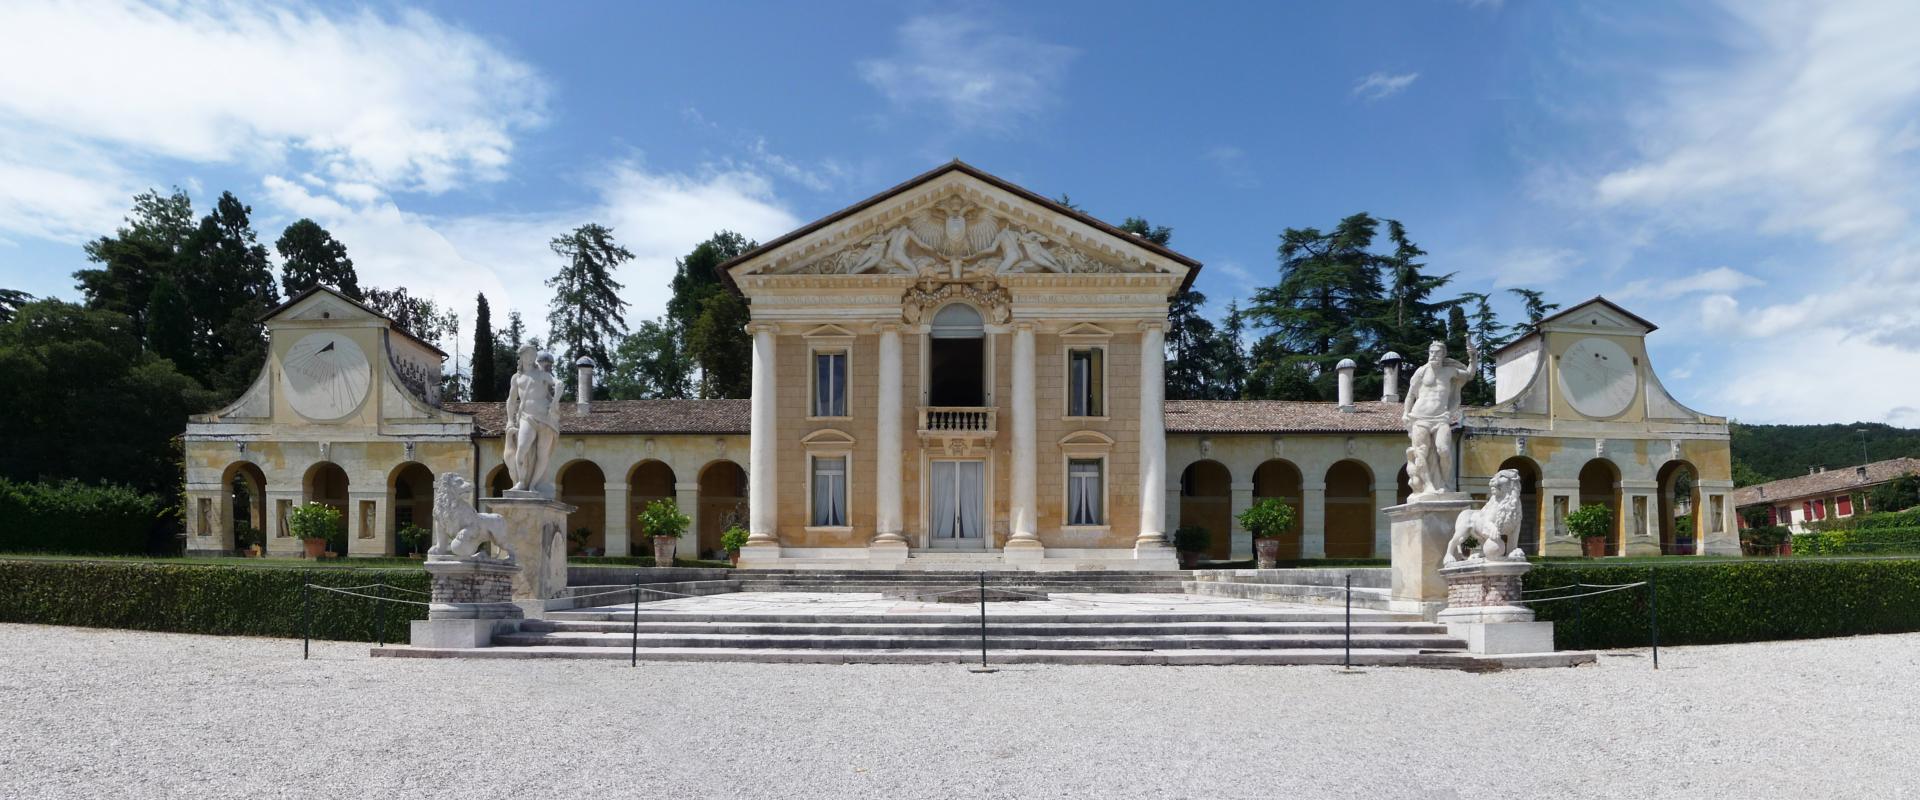 Visit of Asolo and Palladian Villa Barbaro